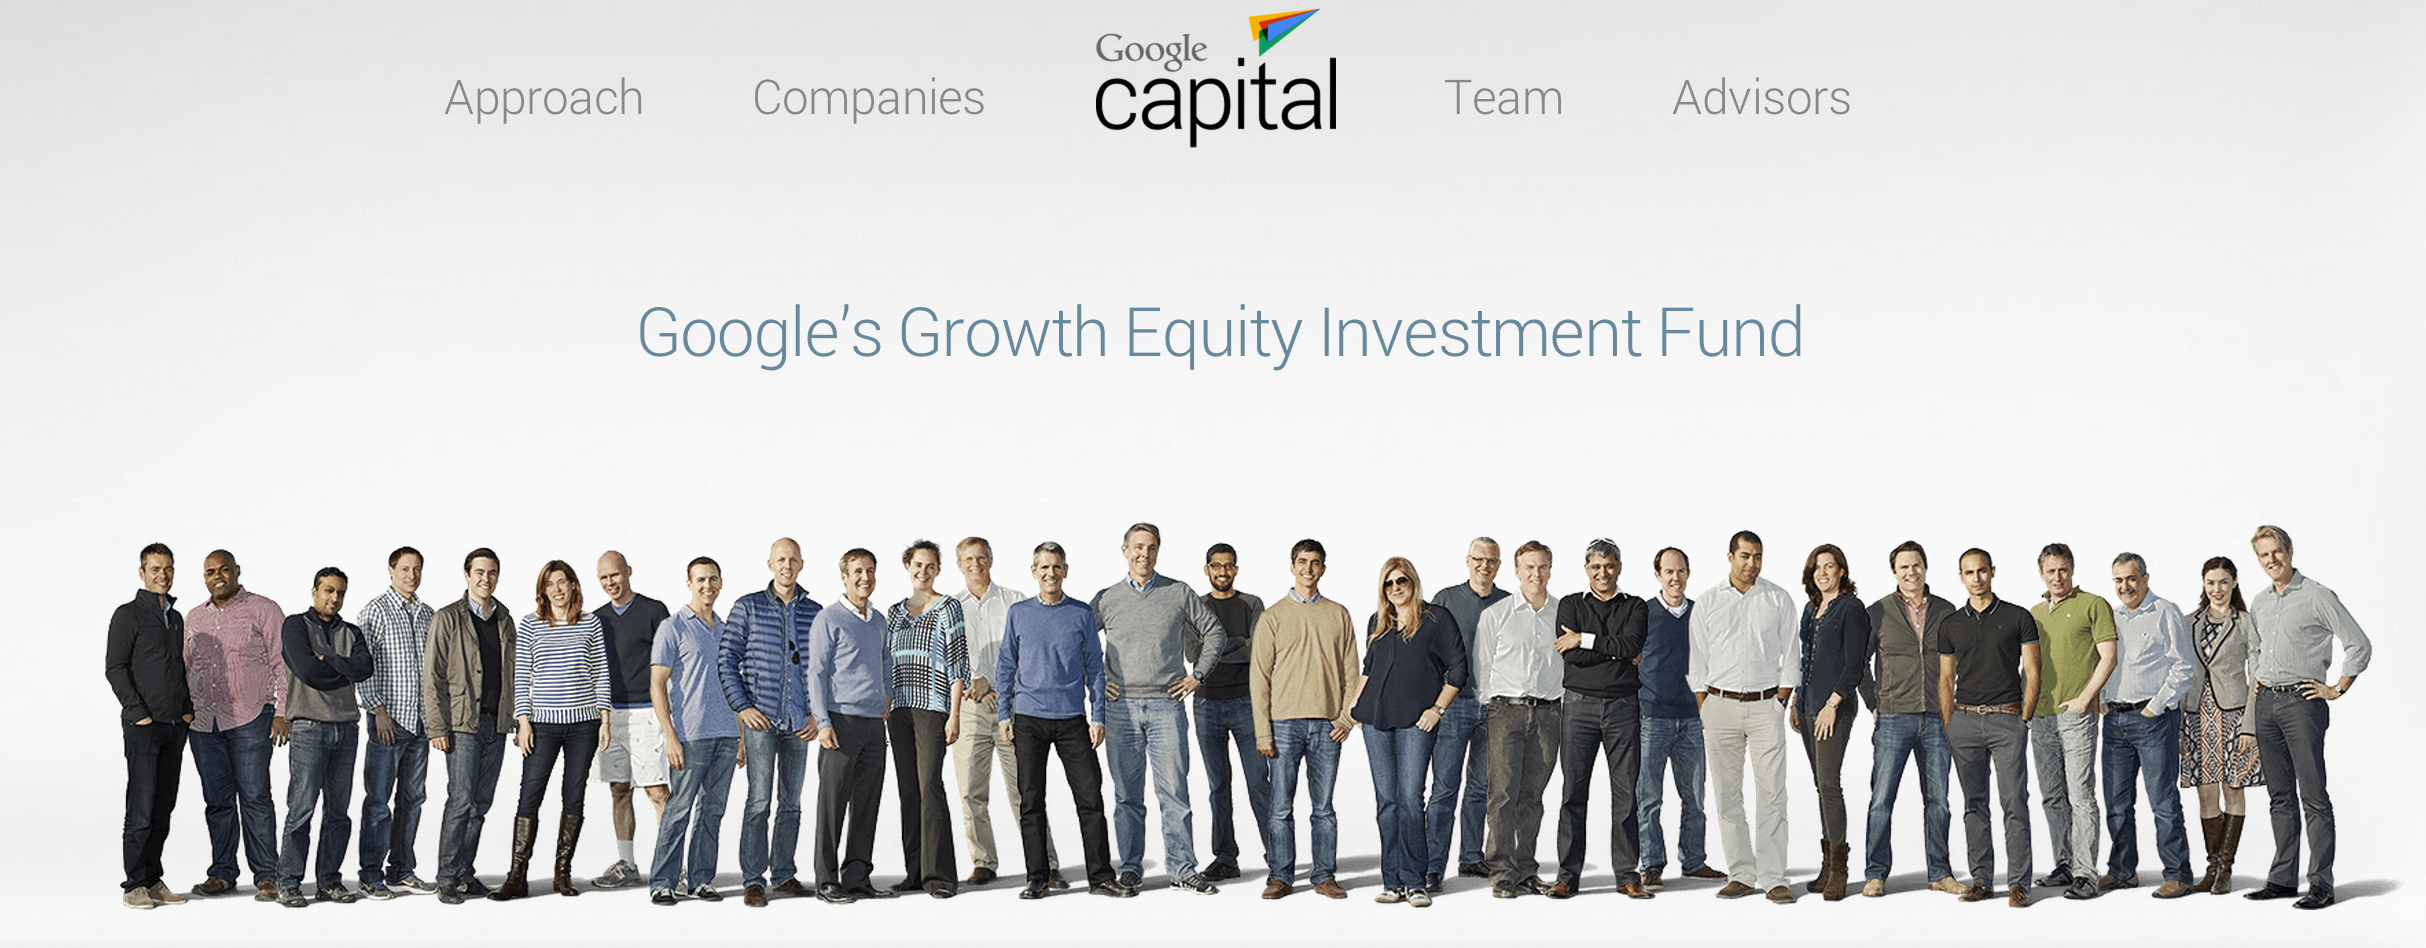 Google_Capital